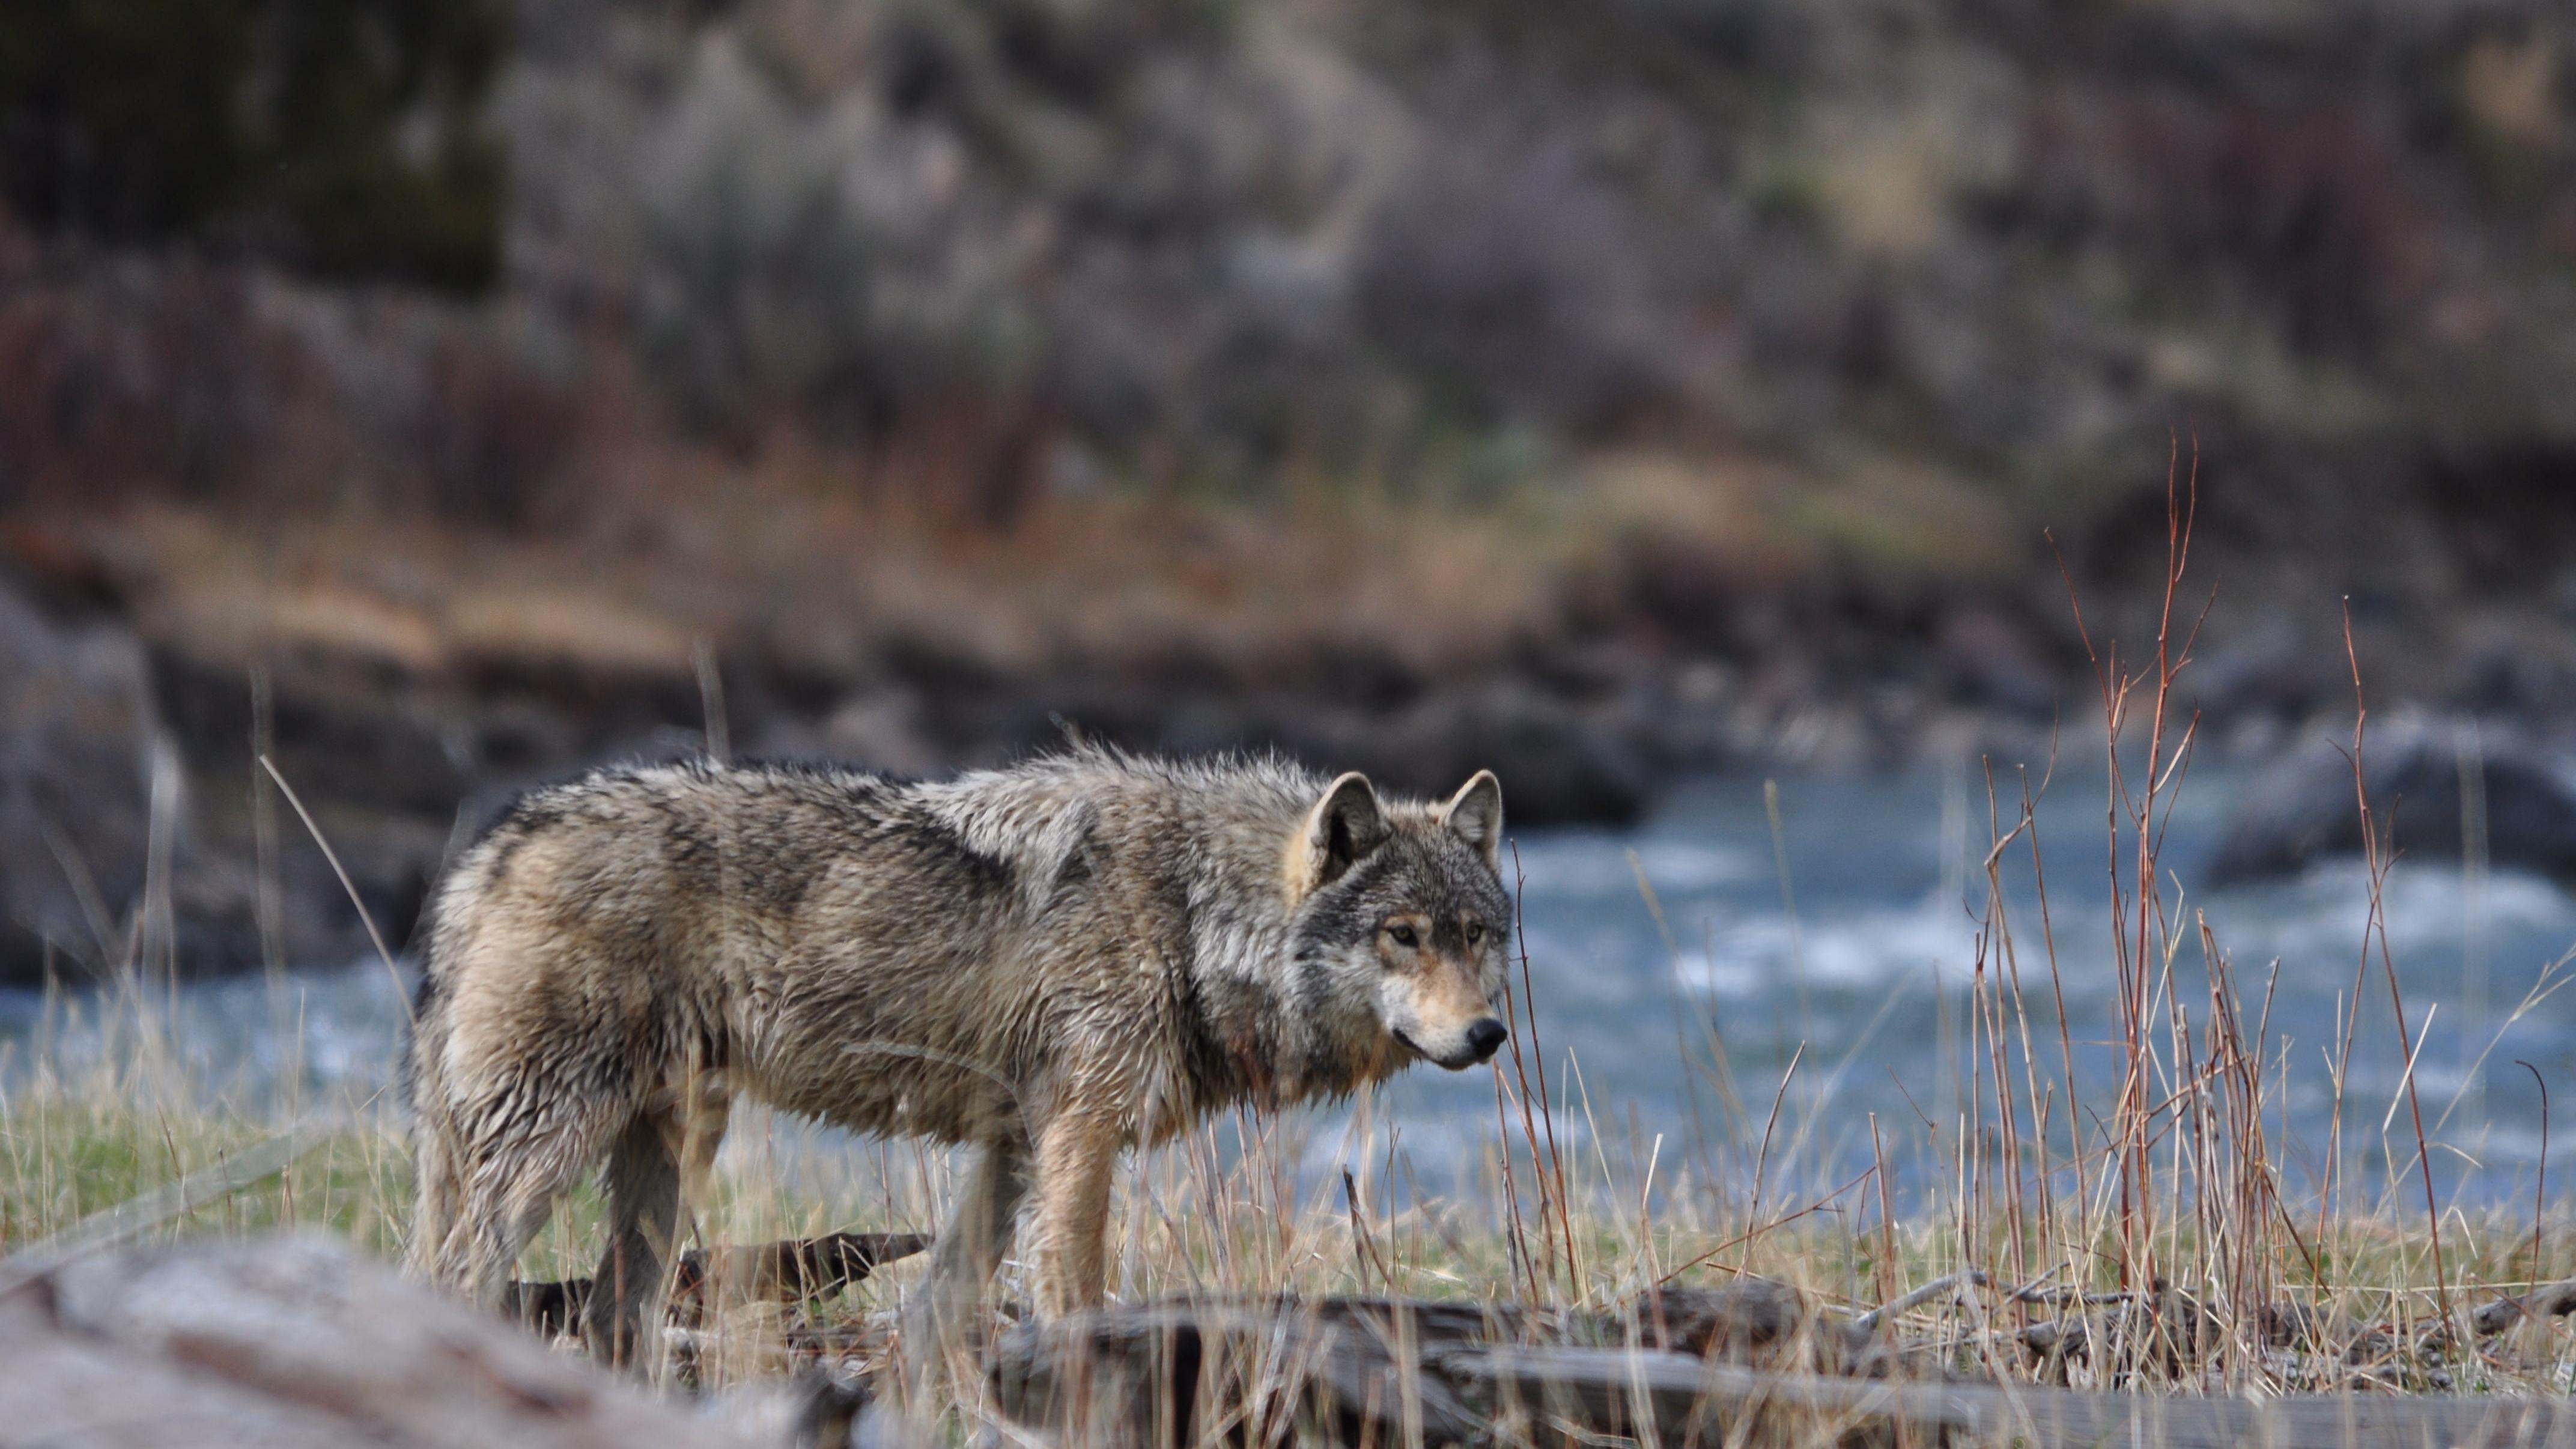 Wolf 4k Ultra HD Wallpaper | Background Image | 4288x2412 ...